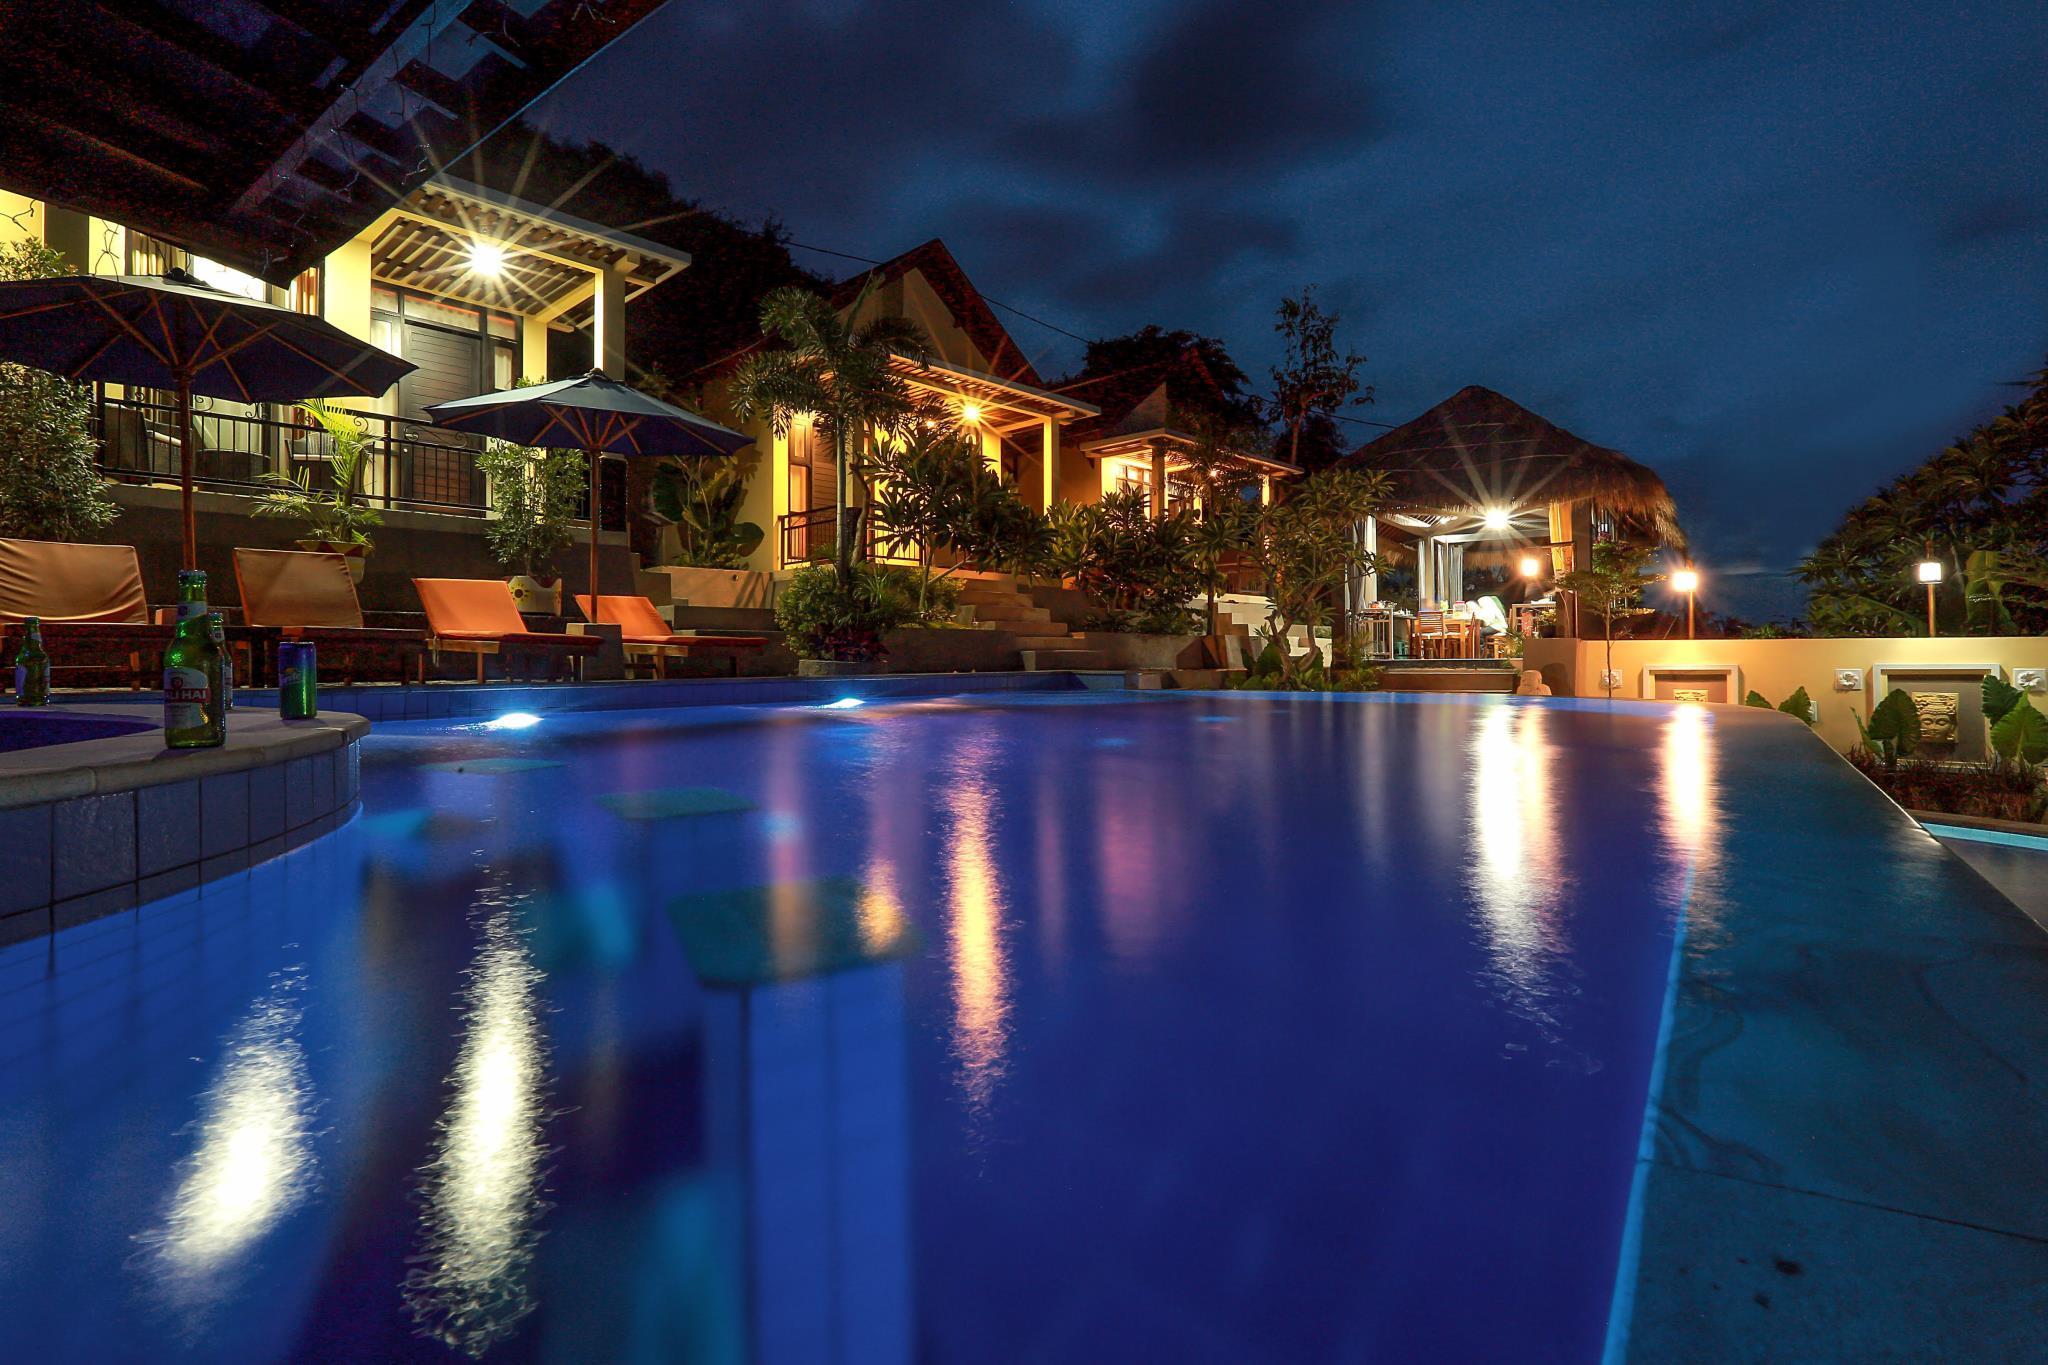 Nipah Pool Villas and Restaurant, Lombok Utara